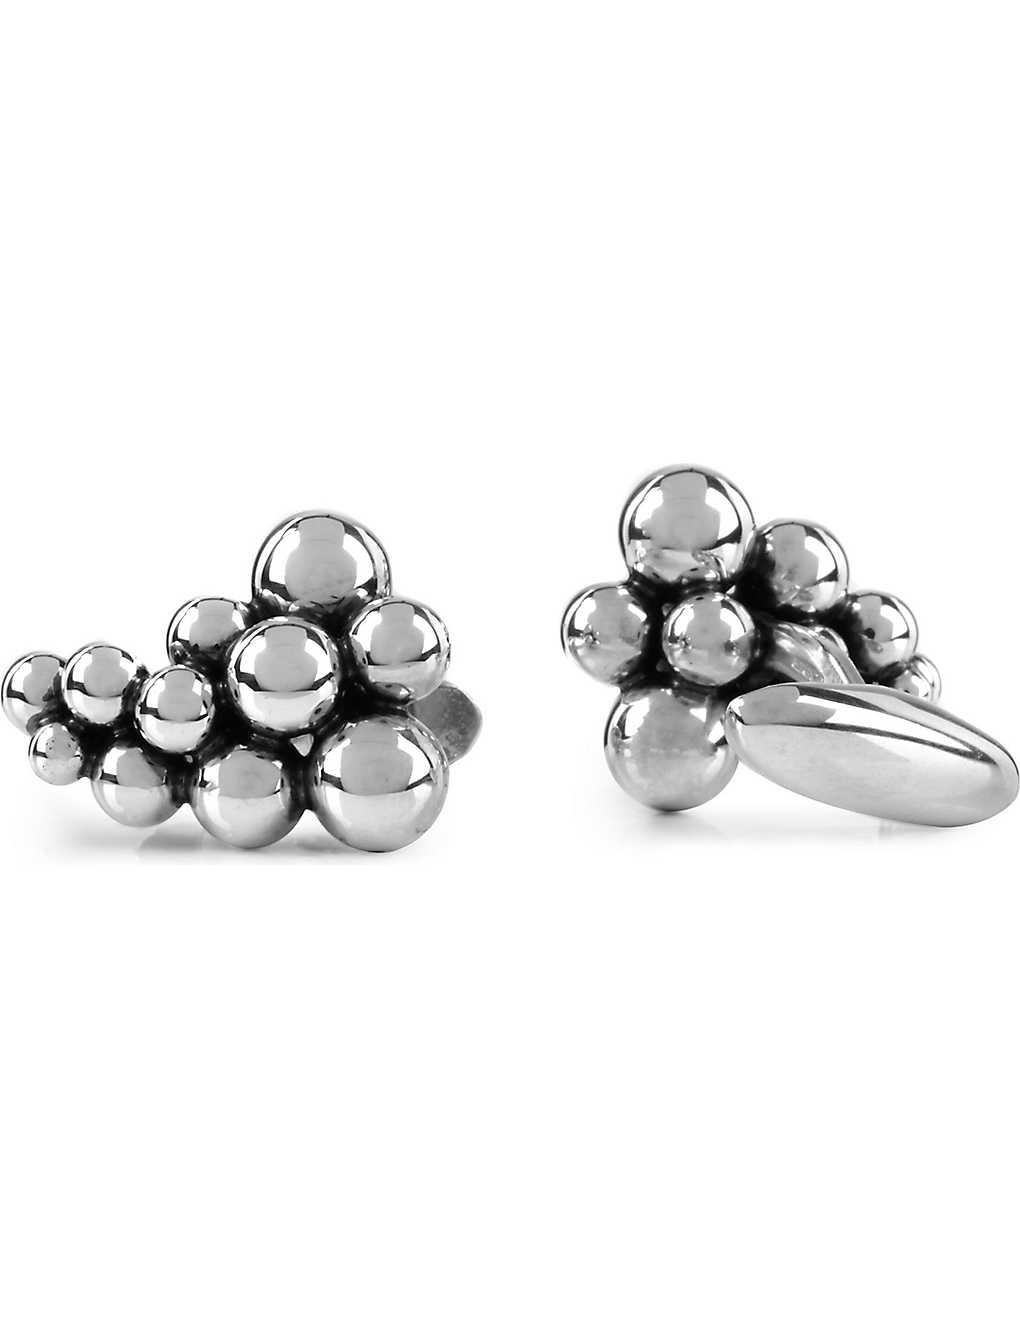 5abce6f4a GEORG JENSEN - Moonlight Grapes sterling silver cufflinks ...